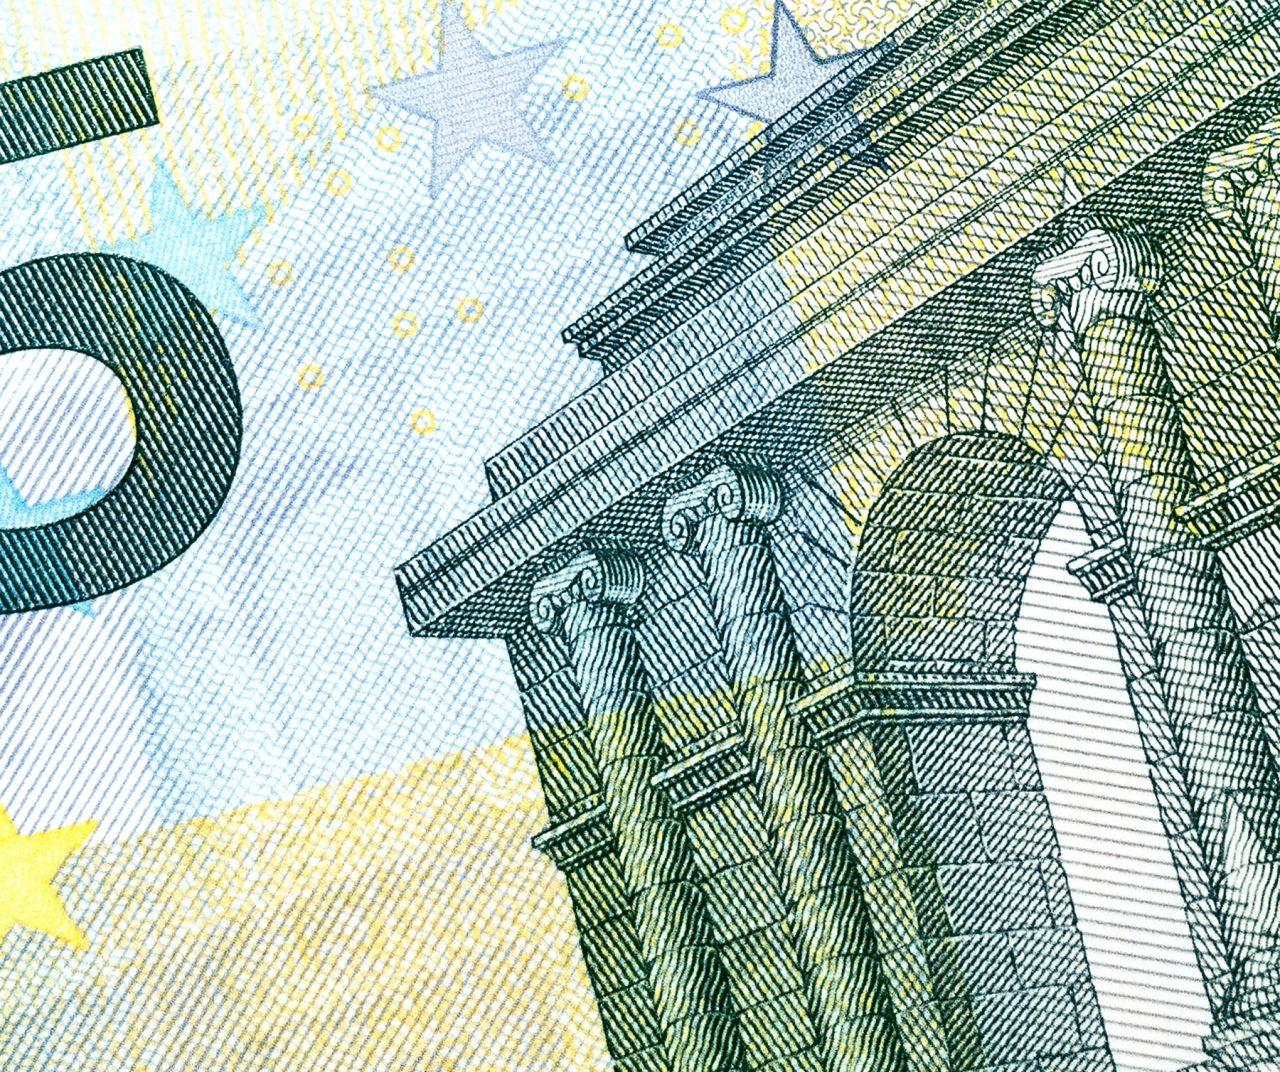 peniaze, bankovka, prosperita, zarabanie